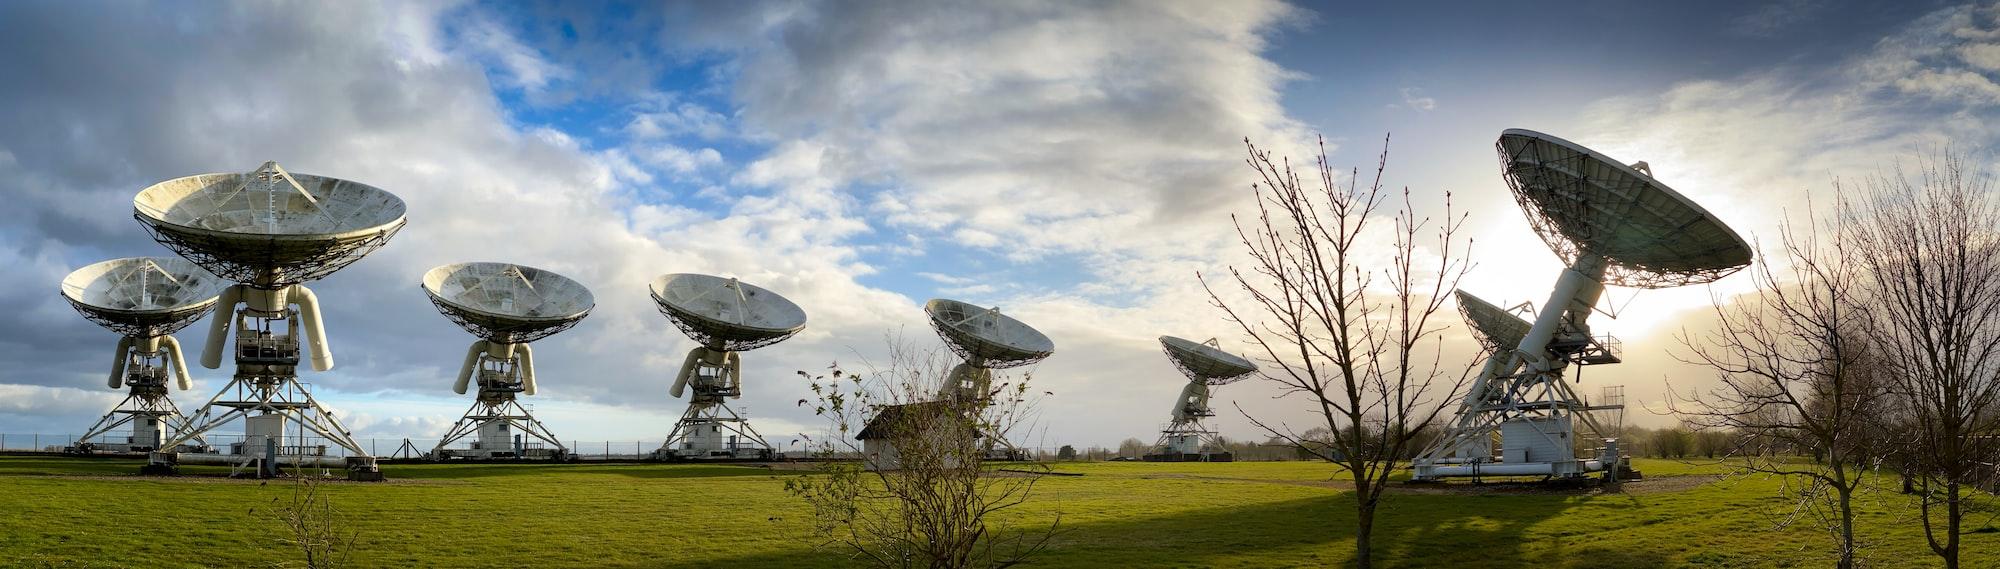 Radio telescopes at the Mullard Radio Observatory just outside Cambridge